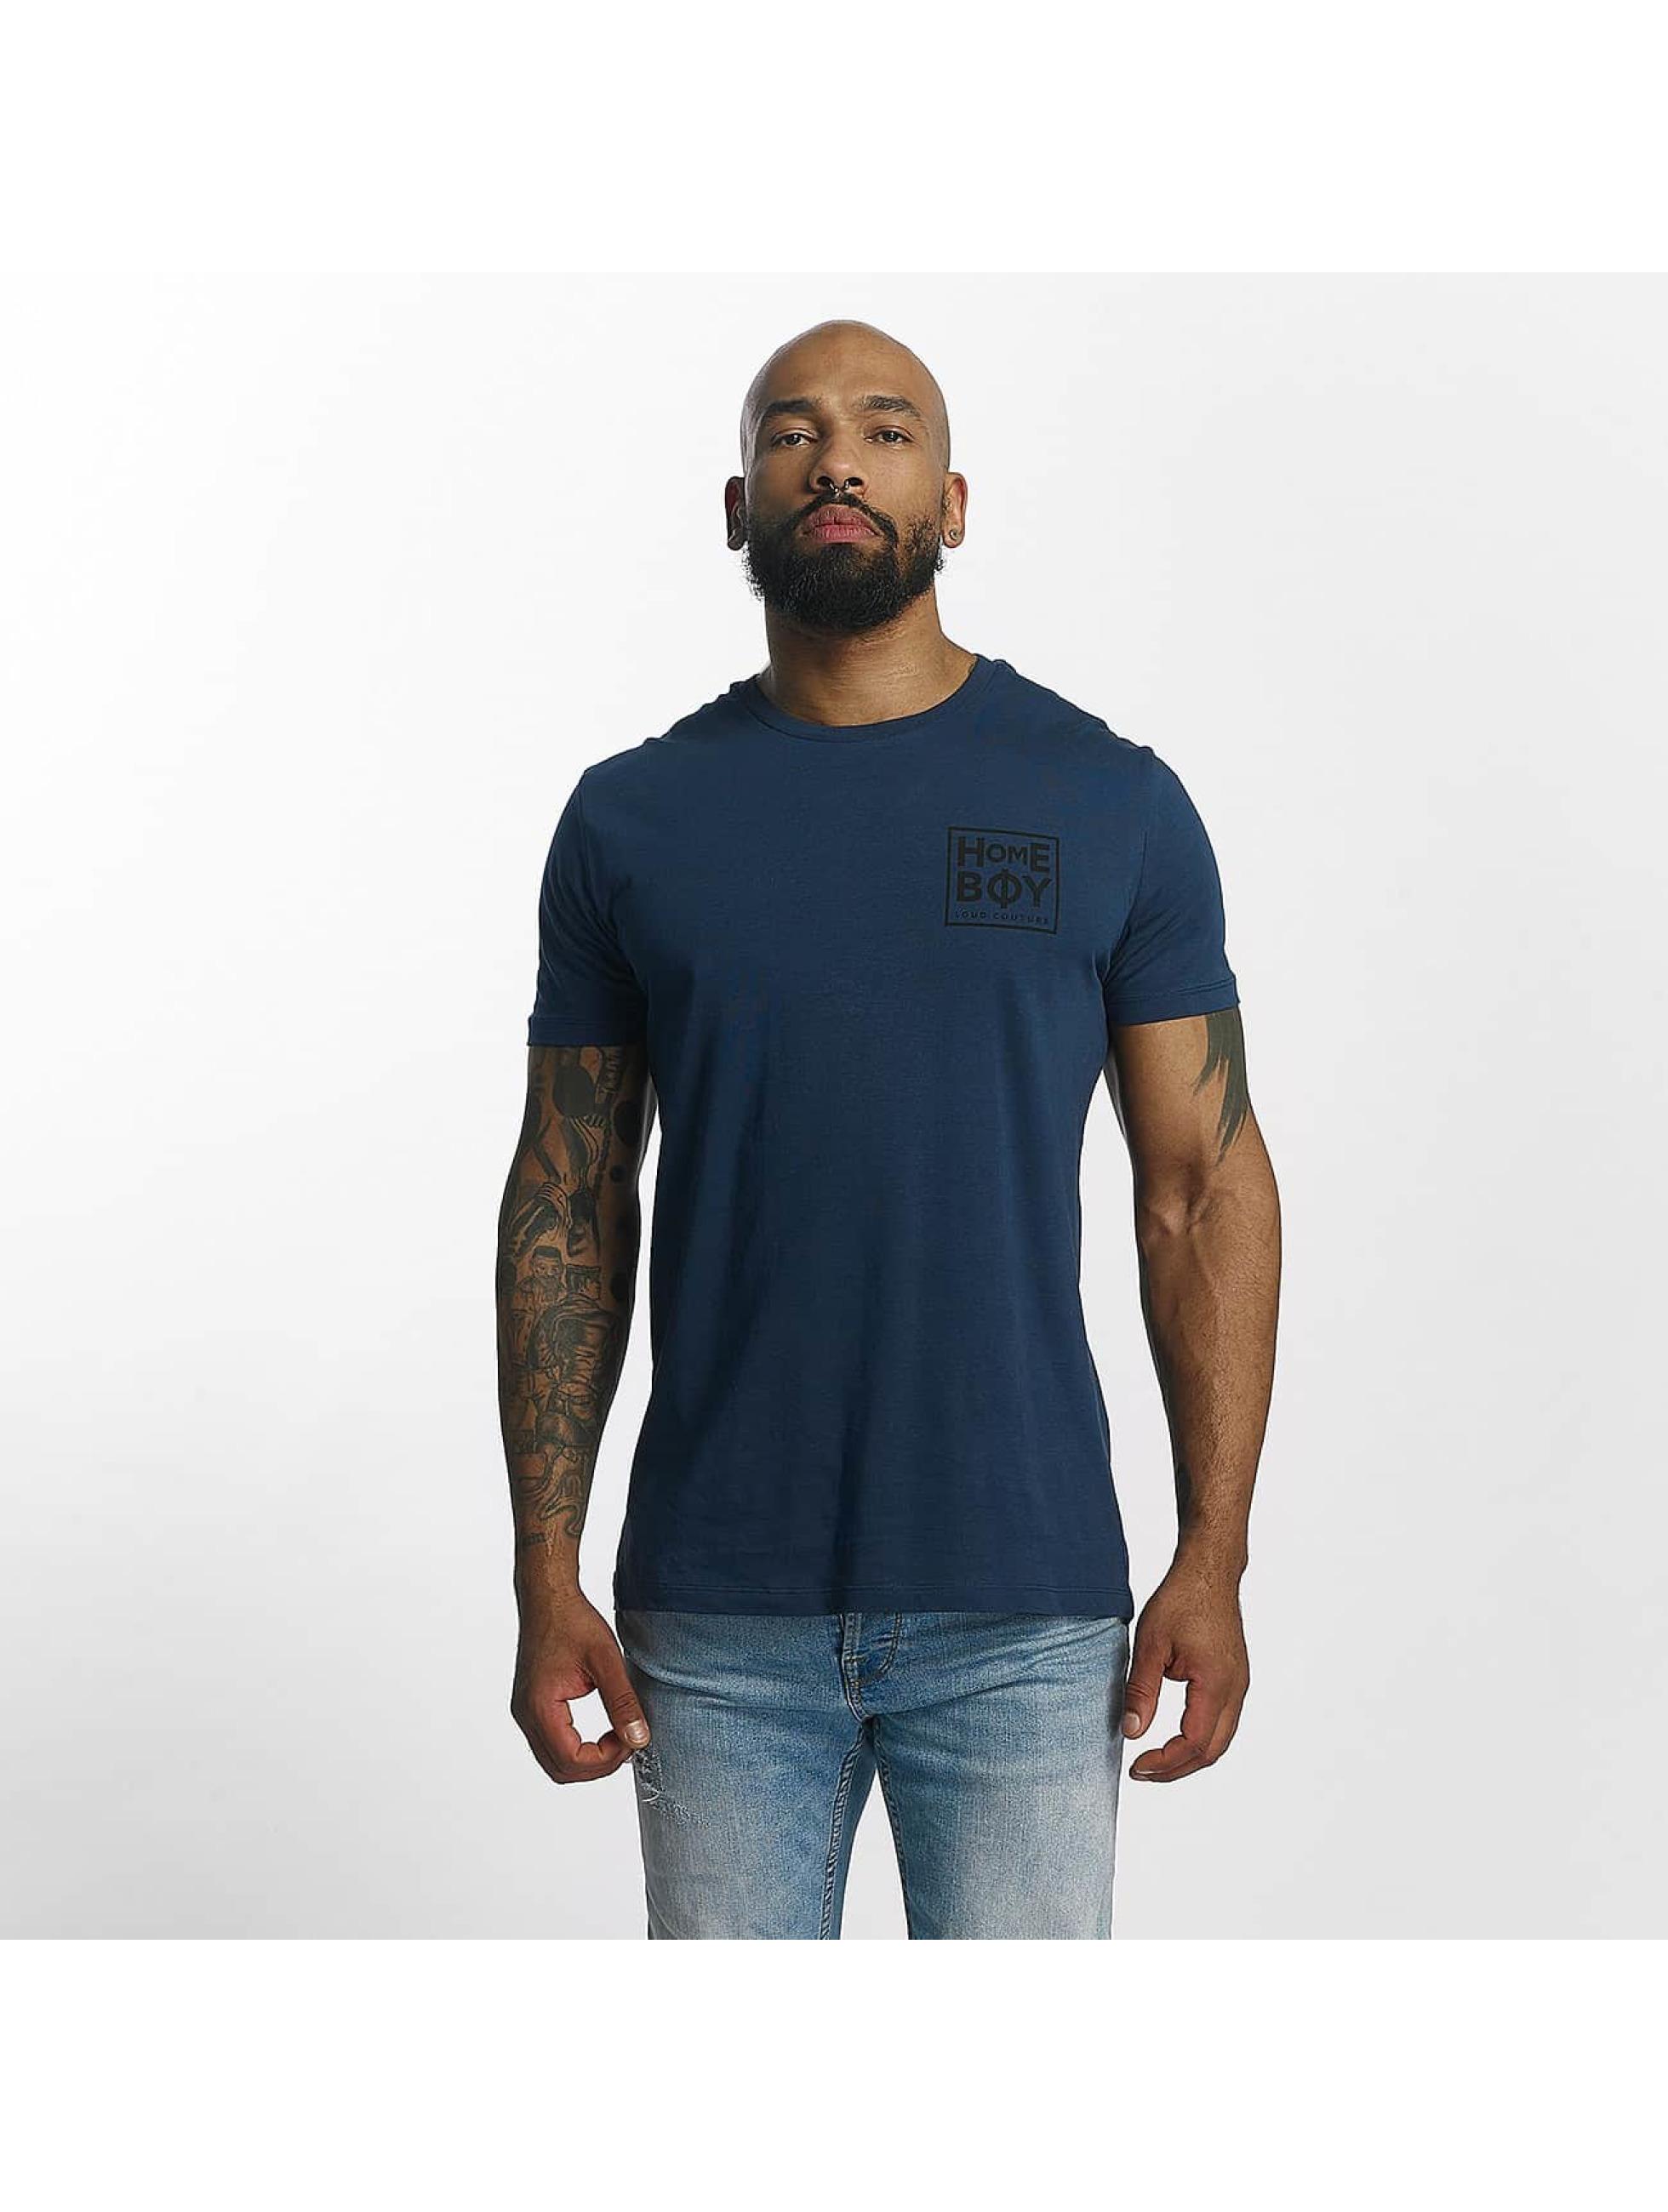 Homeboy Camiseta Take You Home azul